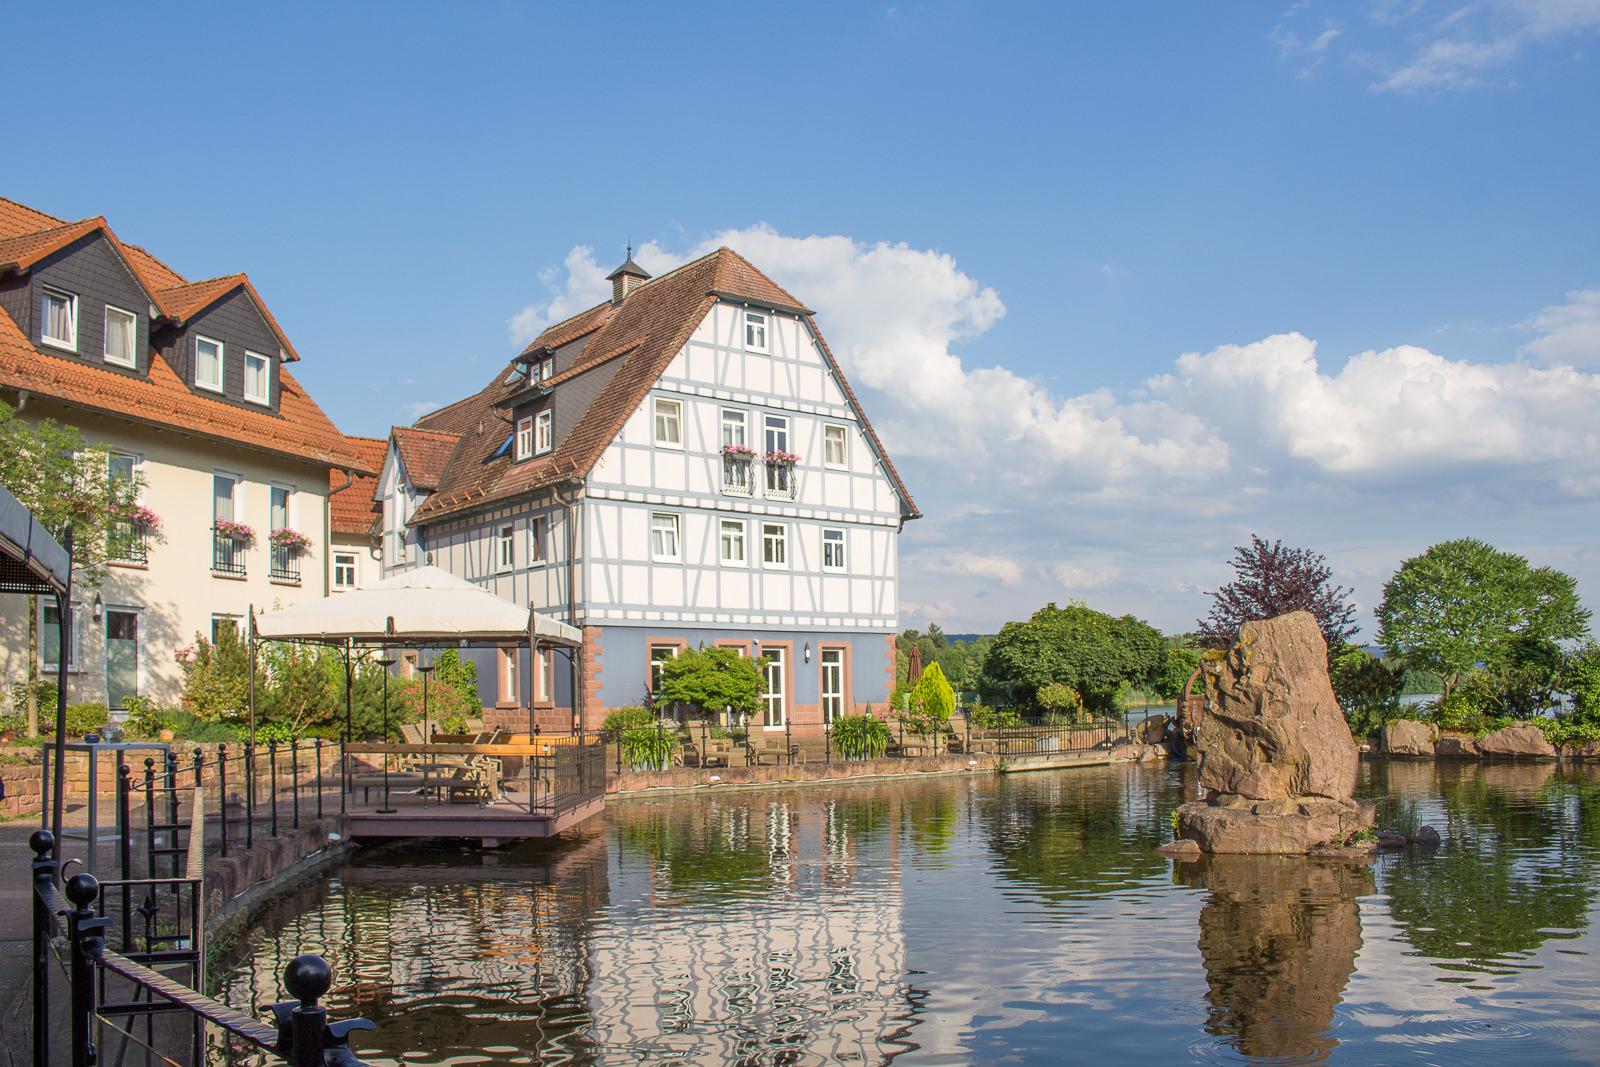 Niedernberg, Seehotel, Das Dorf am See